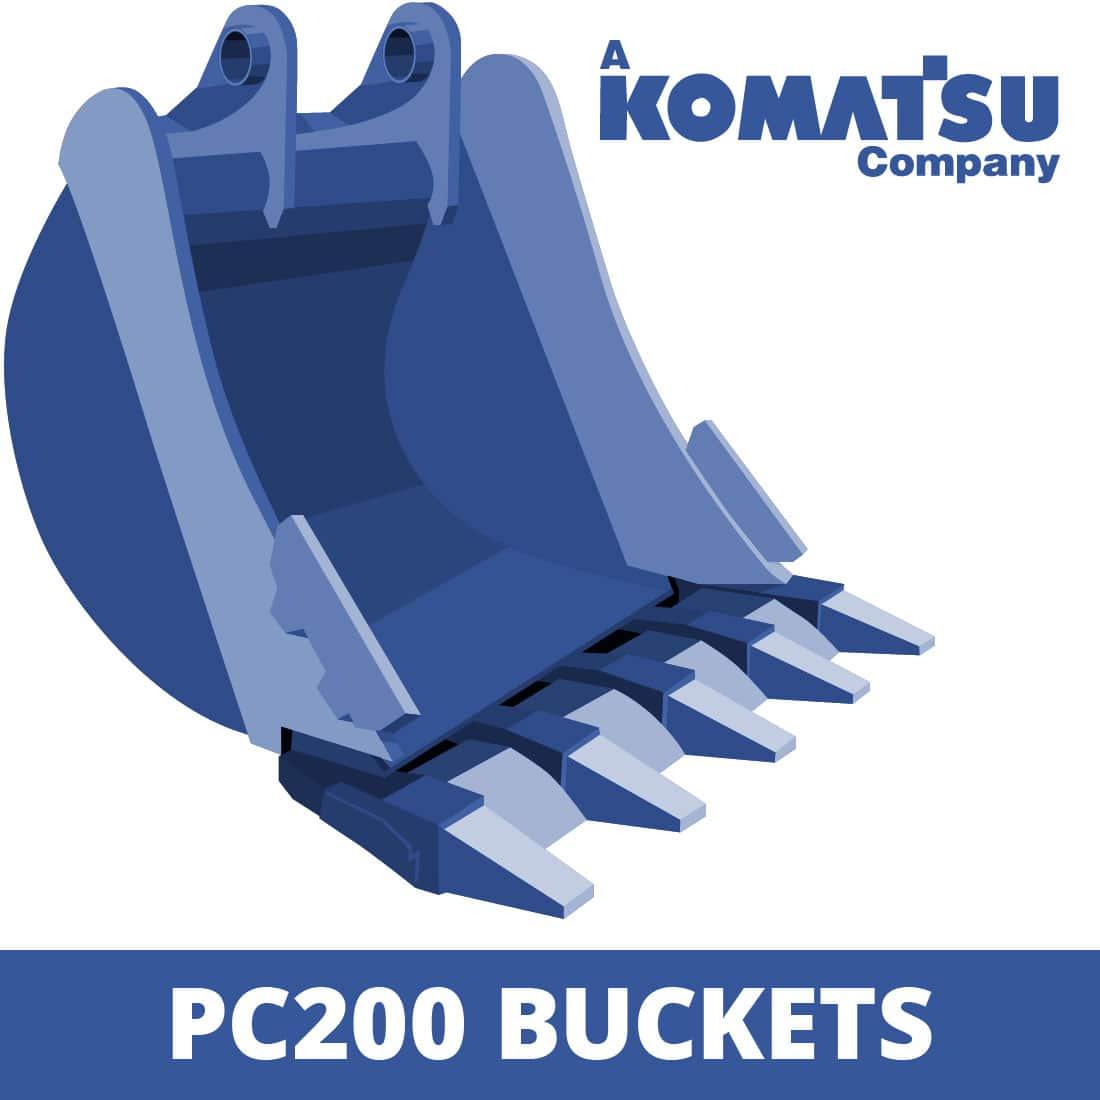 Komatsu PC200 Digger Buckets